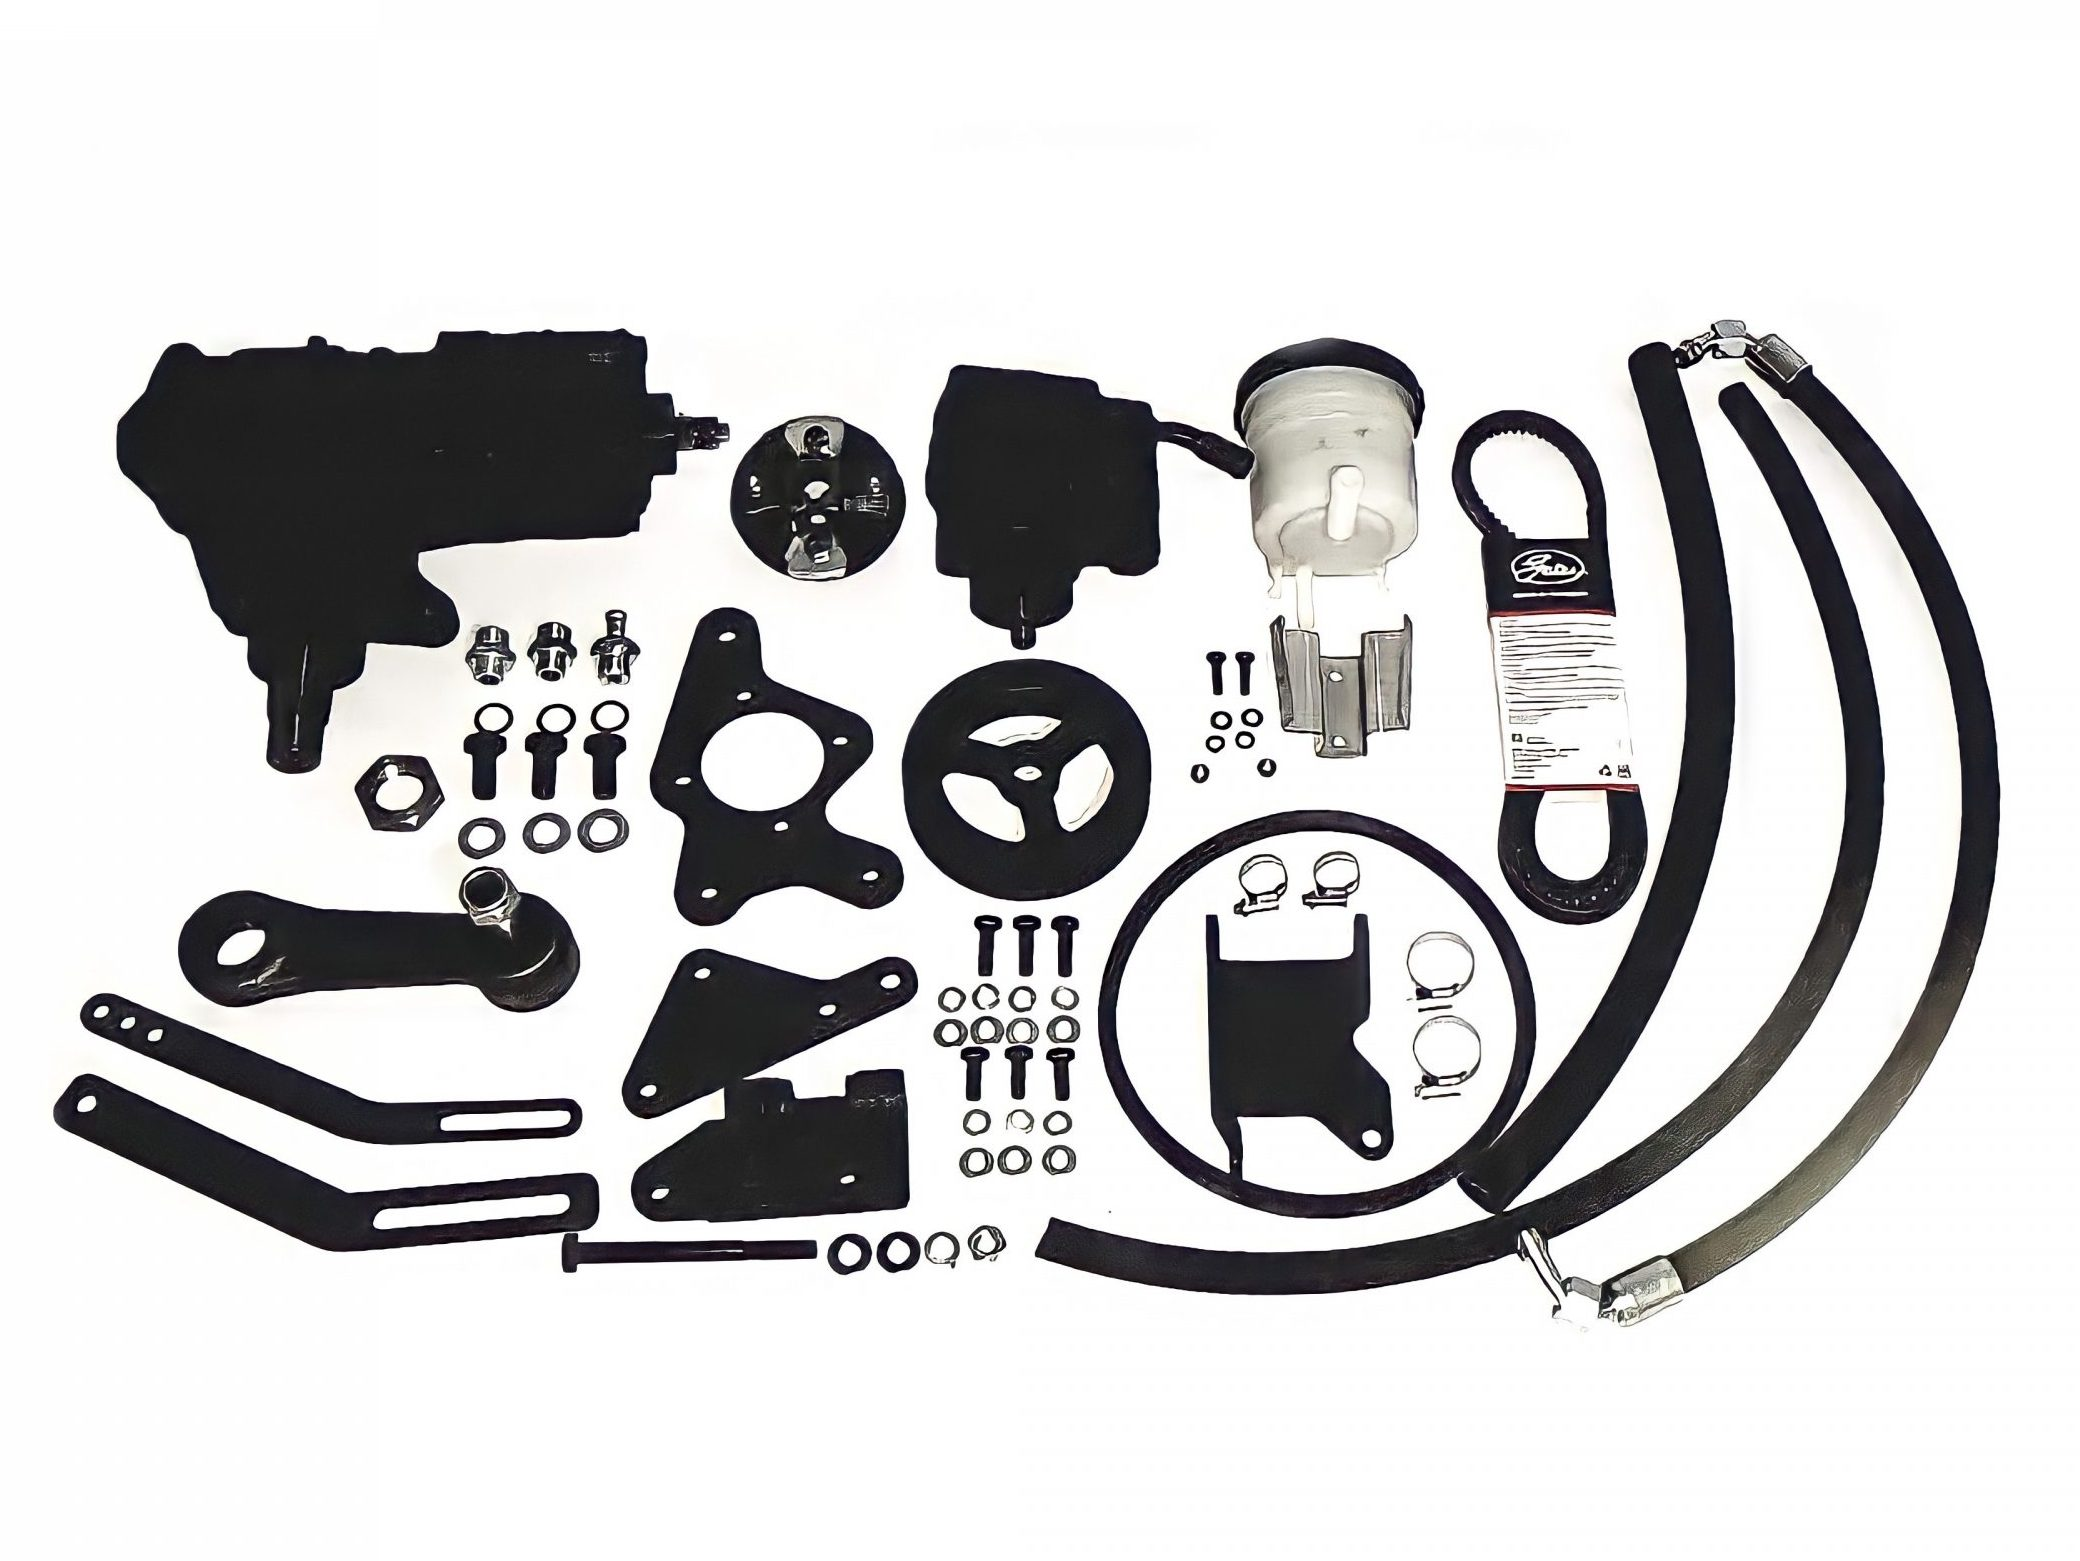 Kit Direção Hidráulica C10 A20 Motor Opala 6 Cilindros 4.1